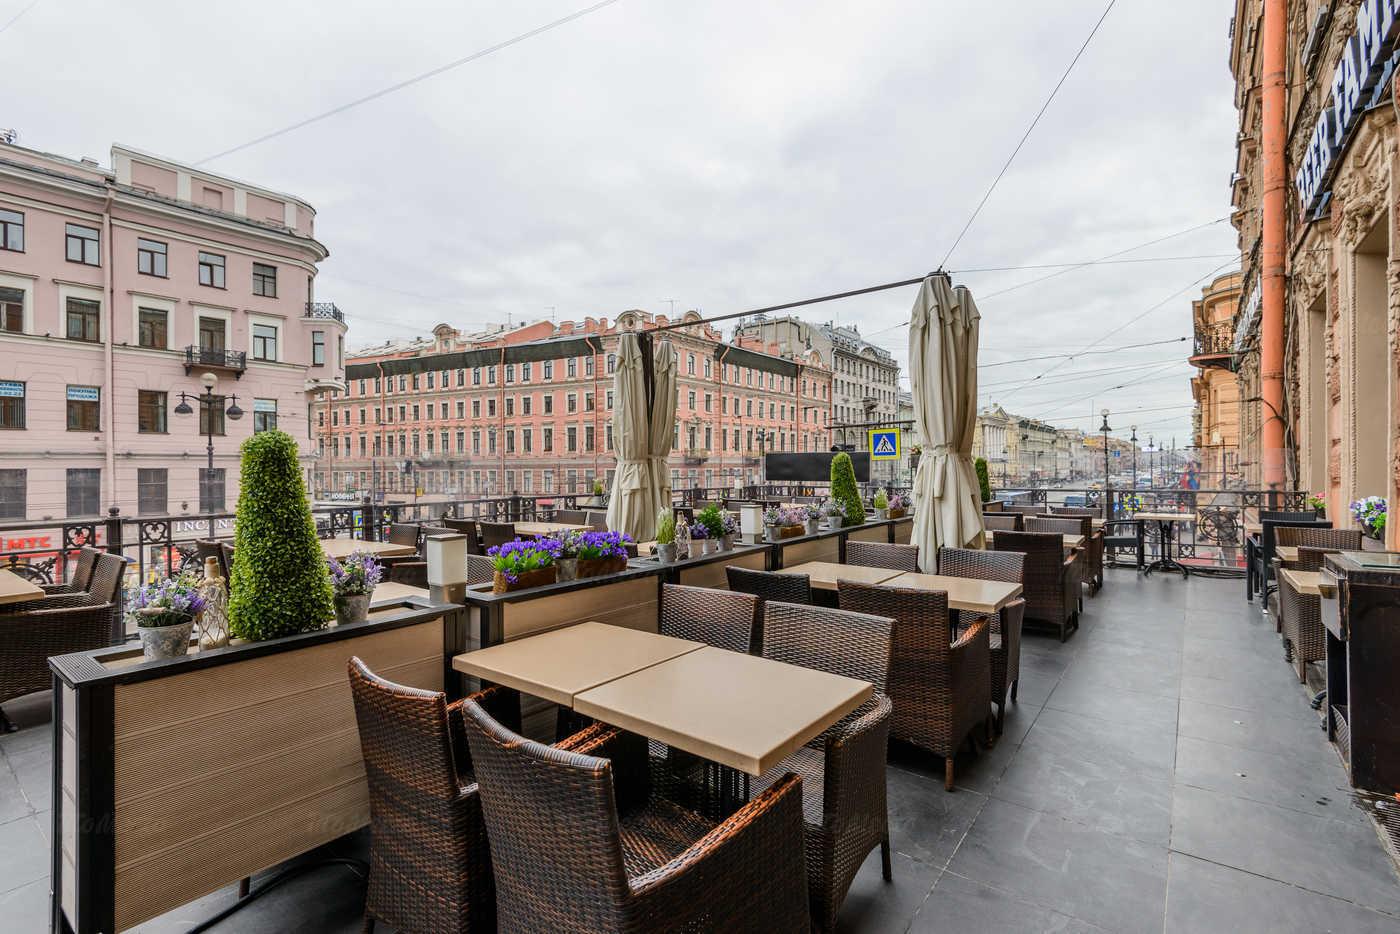 Ресторан Шато Винтаж (Chateau Vintage) на Невском проспекте фото 21